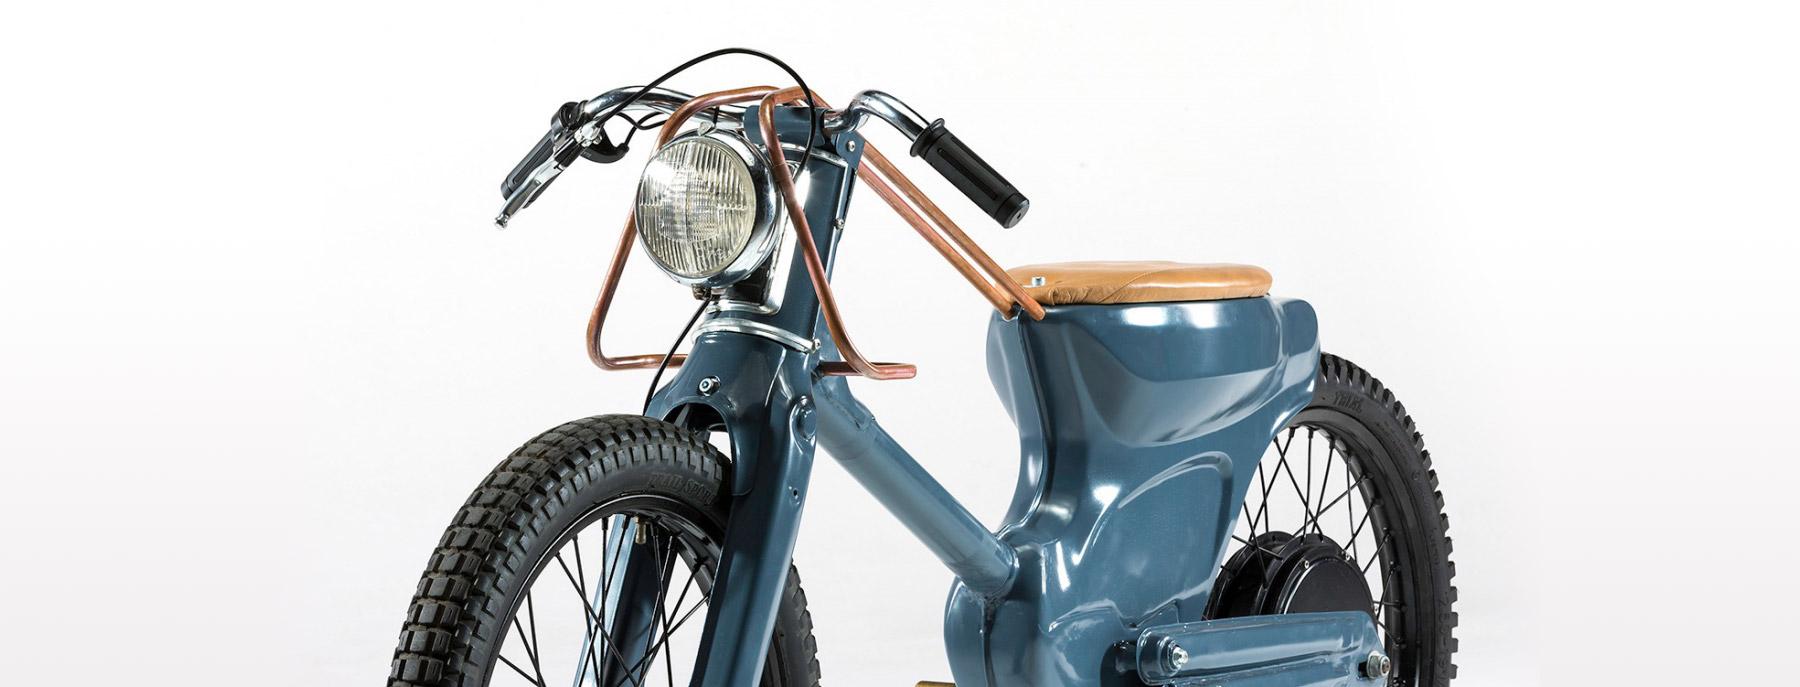 Electric-deus_motorcycle-home